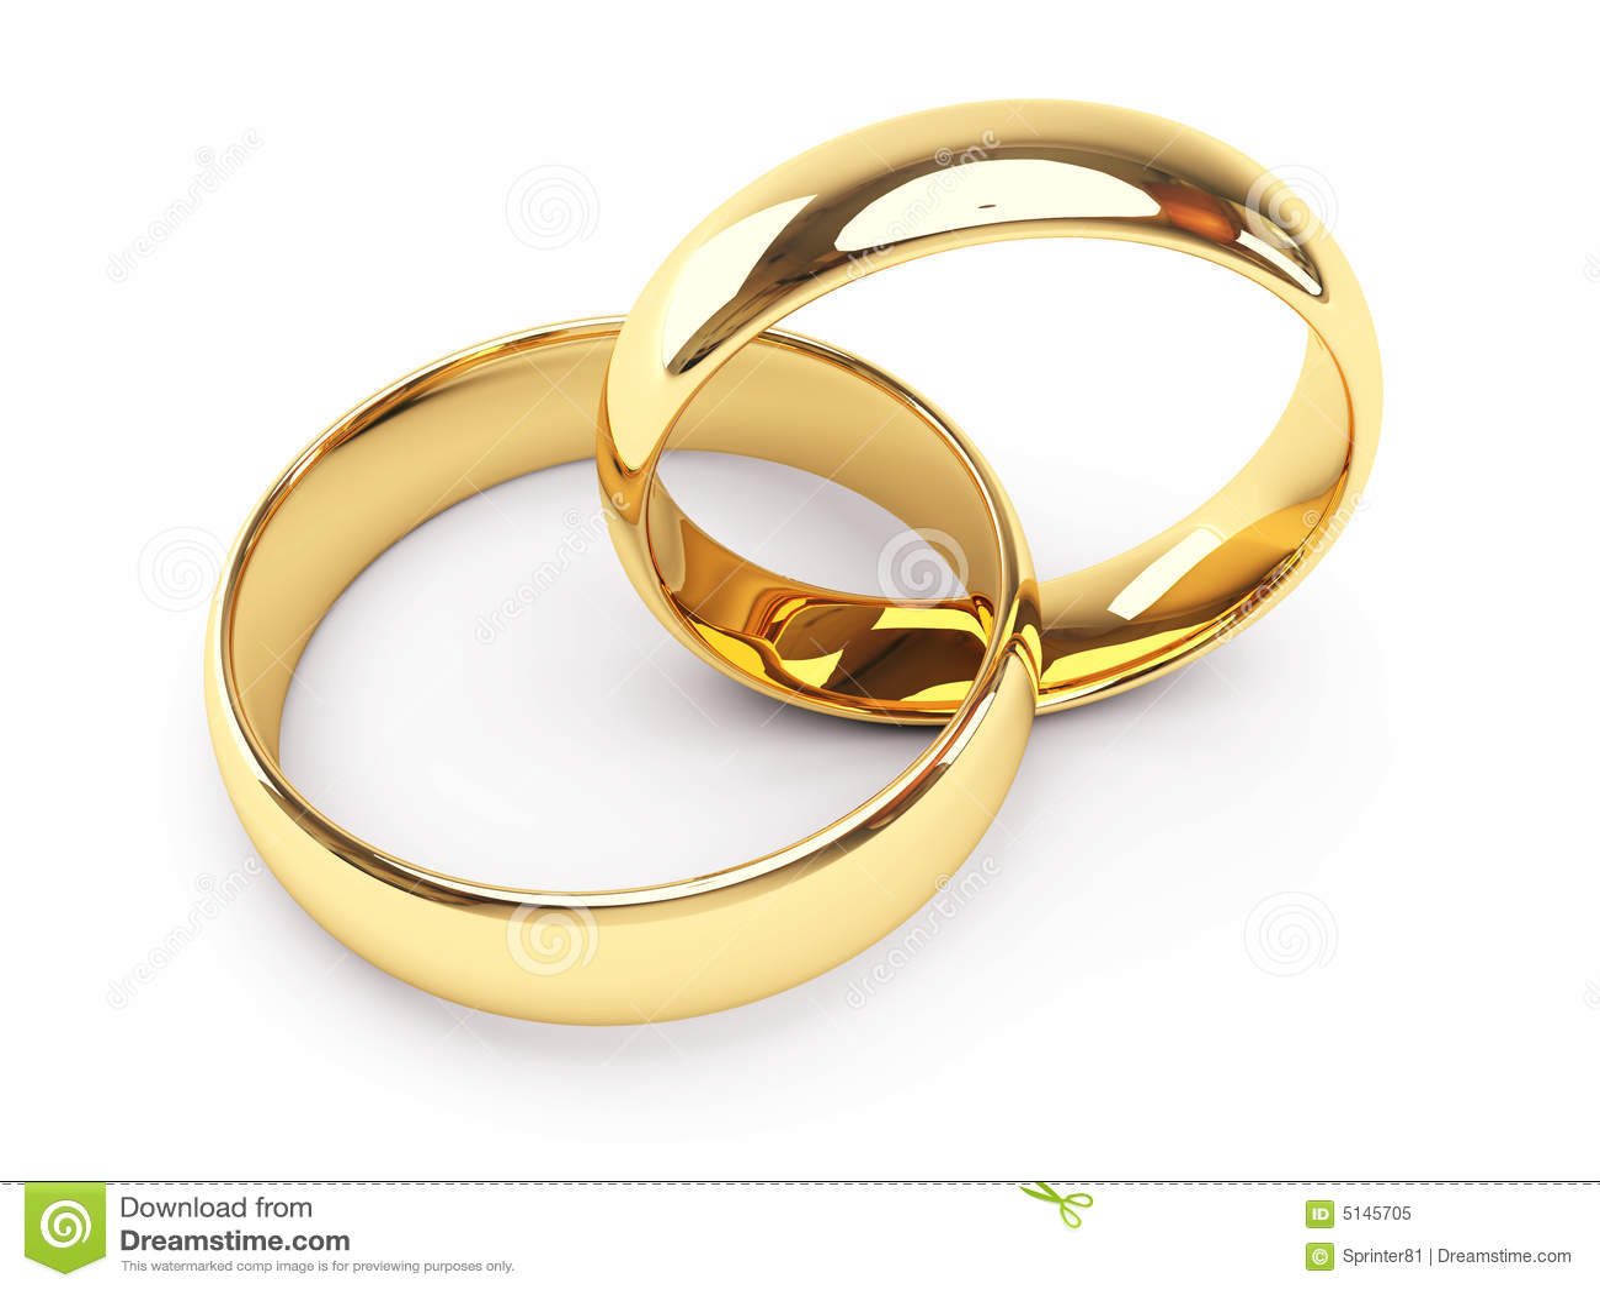 Gold Wedding Rings Royalty Free Stock Photo  Image 5145705